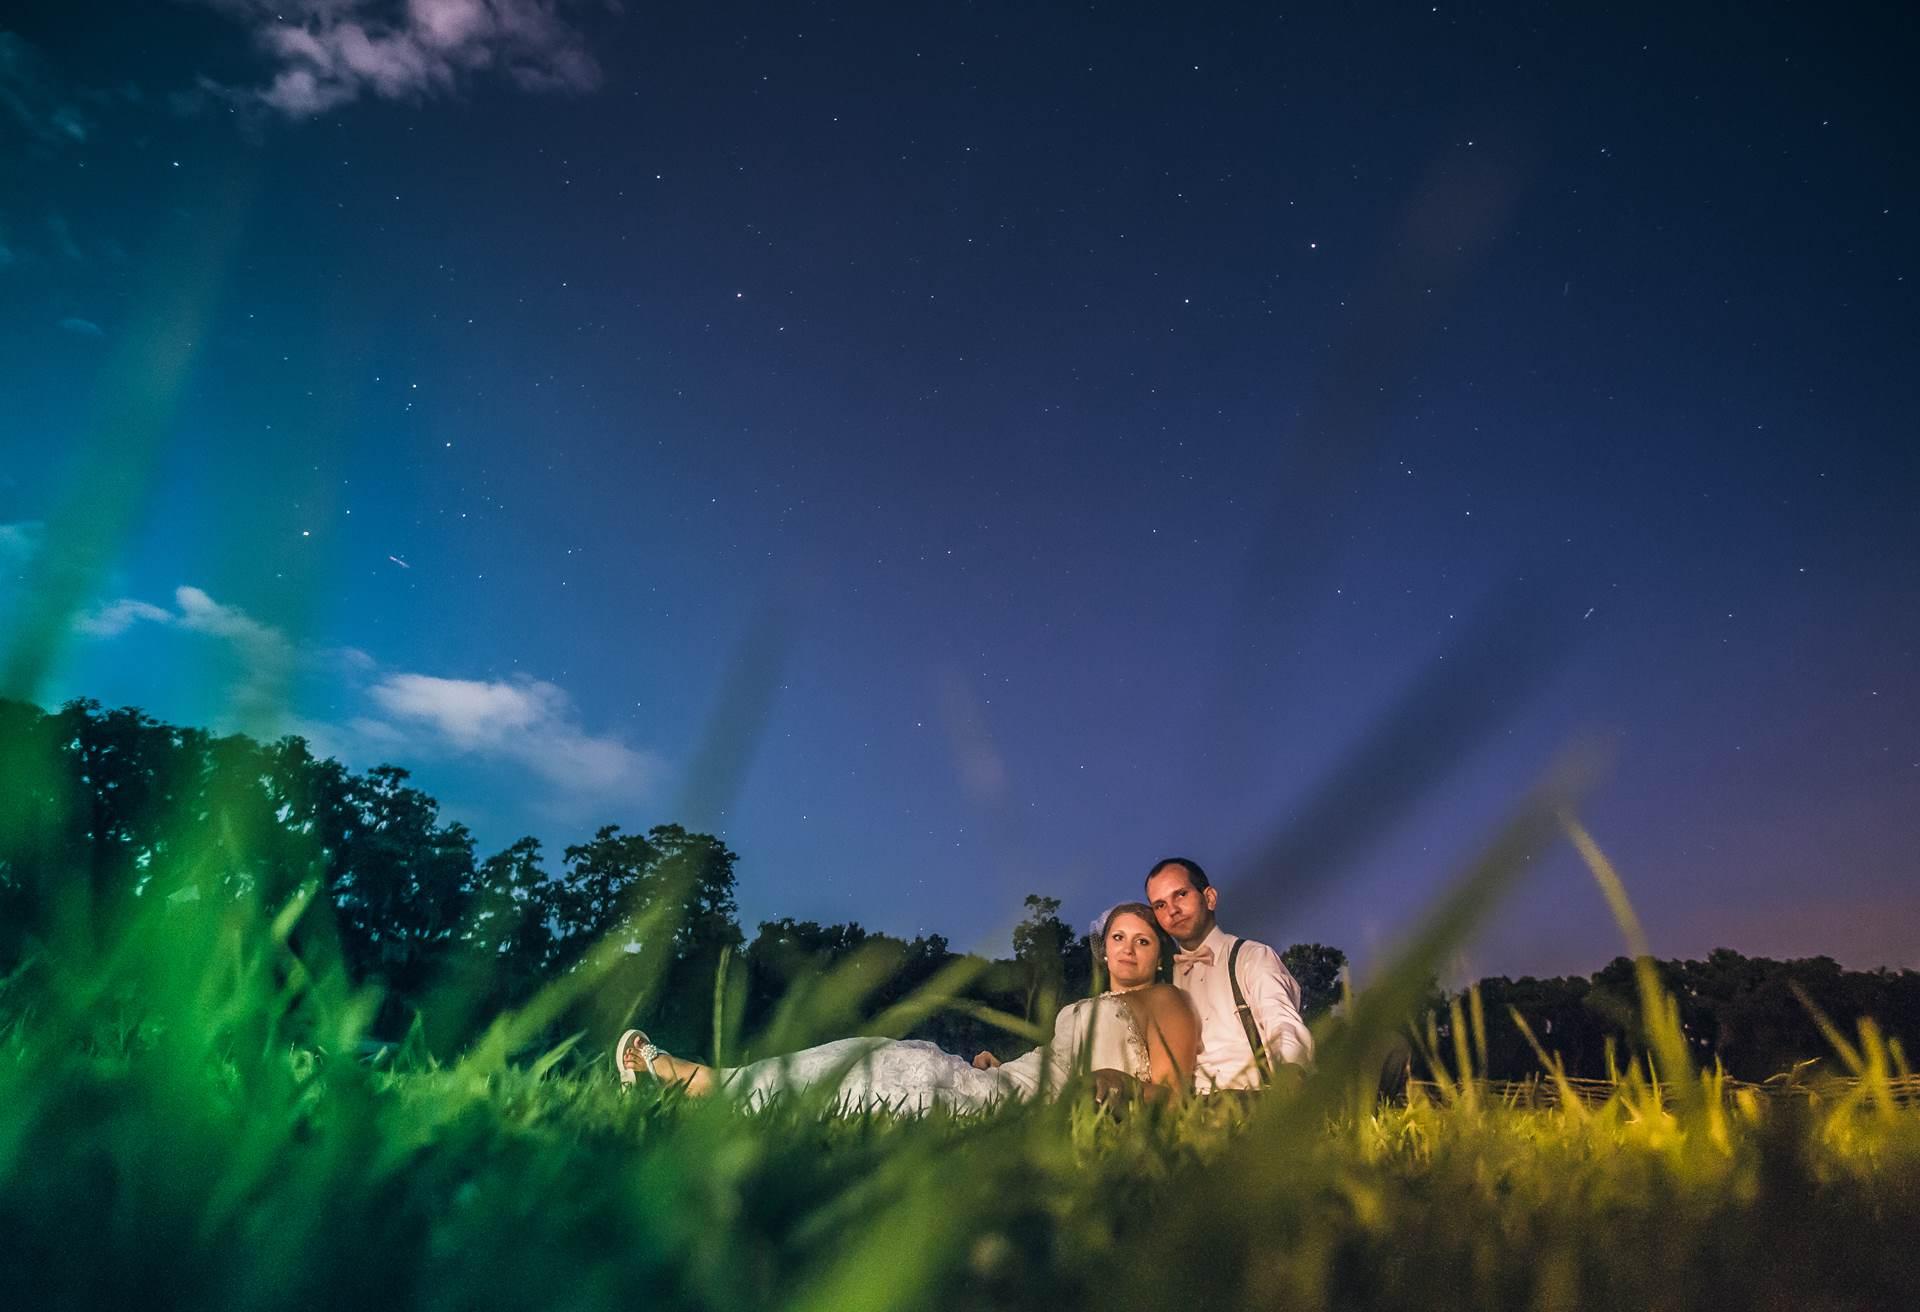 Under the stars at Magnolia Plantation